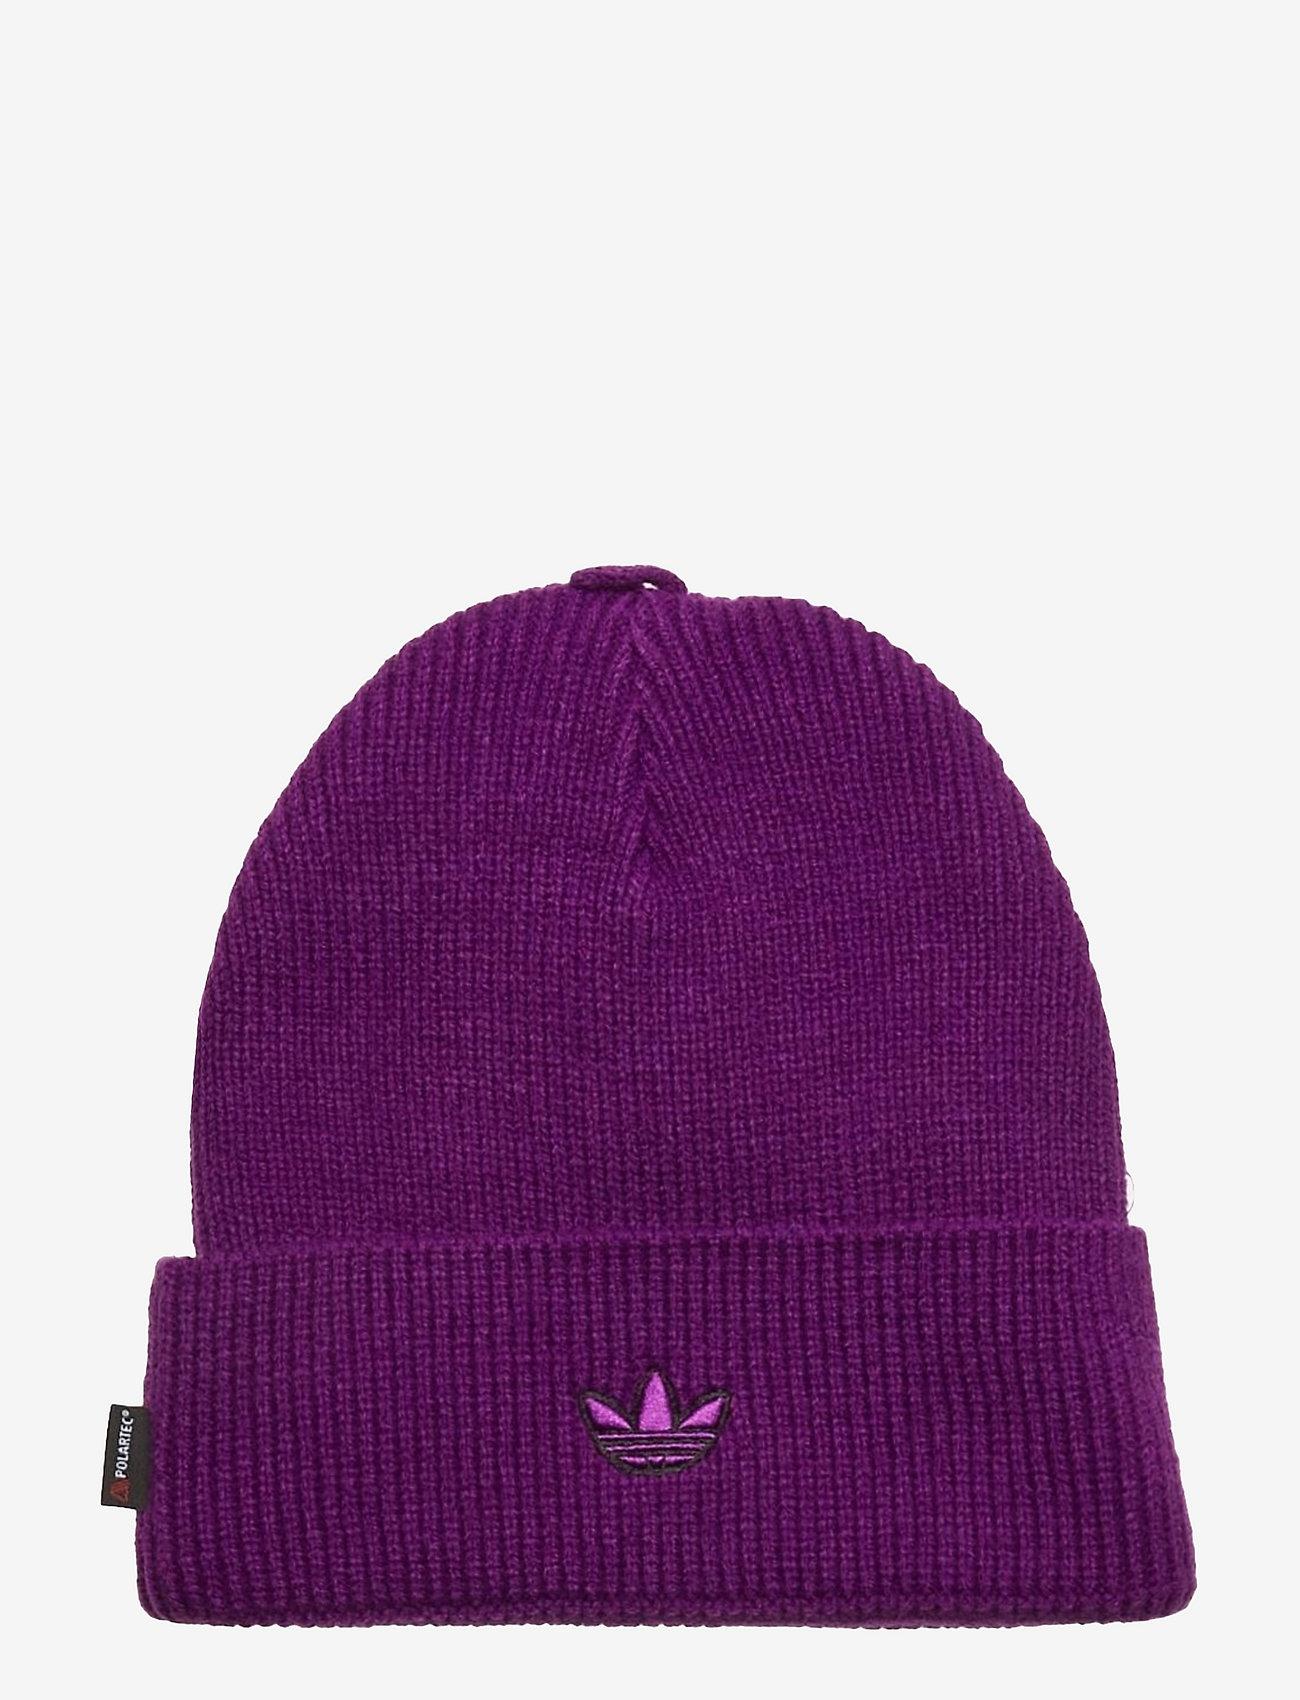 adidas Originals - Adventure Beanie - bonnet - gloprp - 1